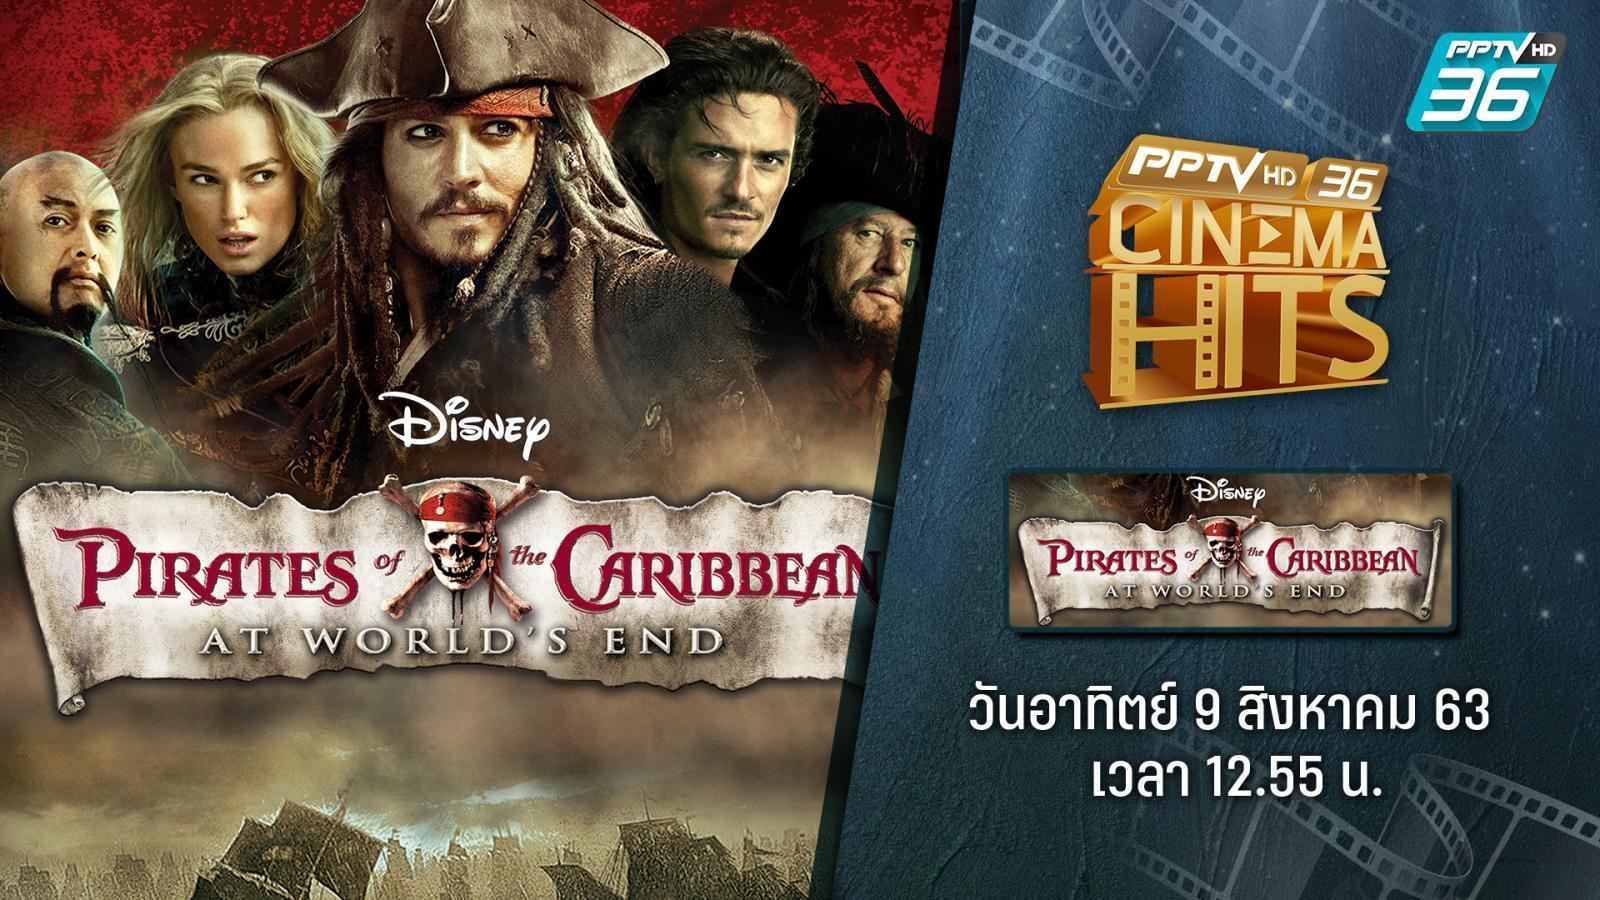 Pirates Of The Caribbean: At World's End ผจญภัยล่าโจรสลัดสุดขอบโลก